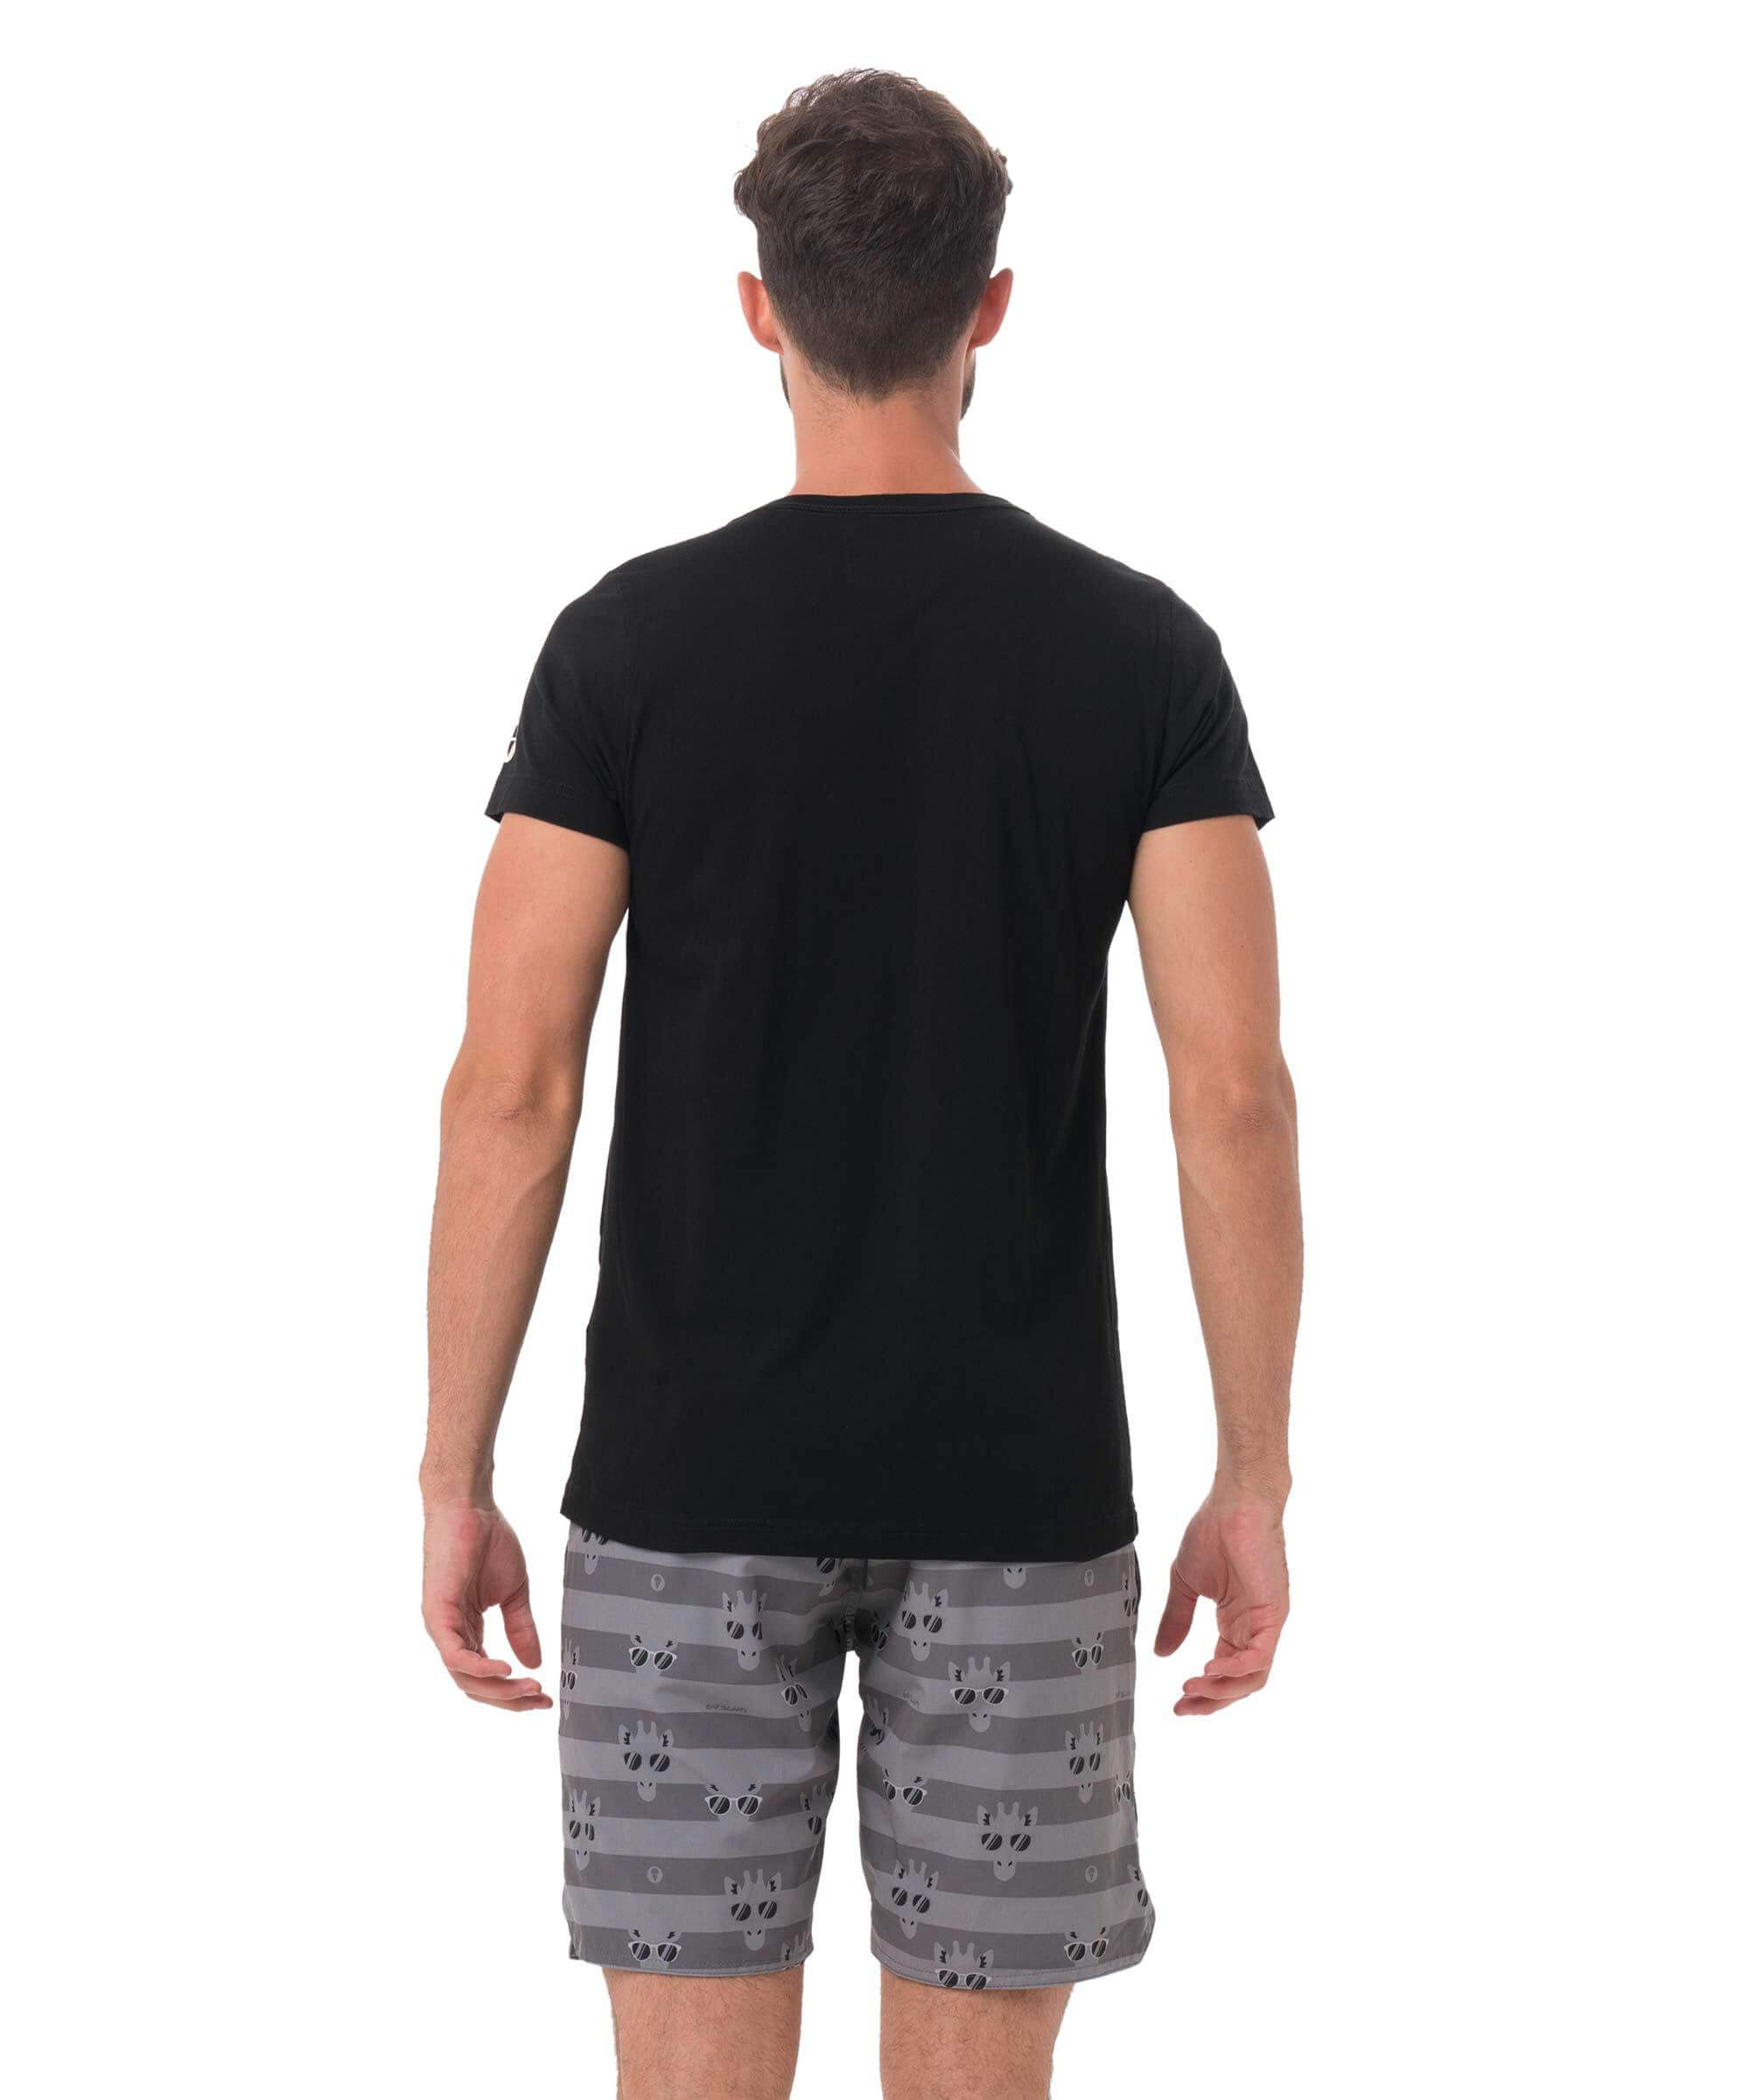 ROK BAGOROS x 69SLAM COLLAB BLACK T-SHIRT